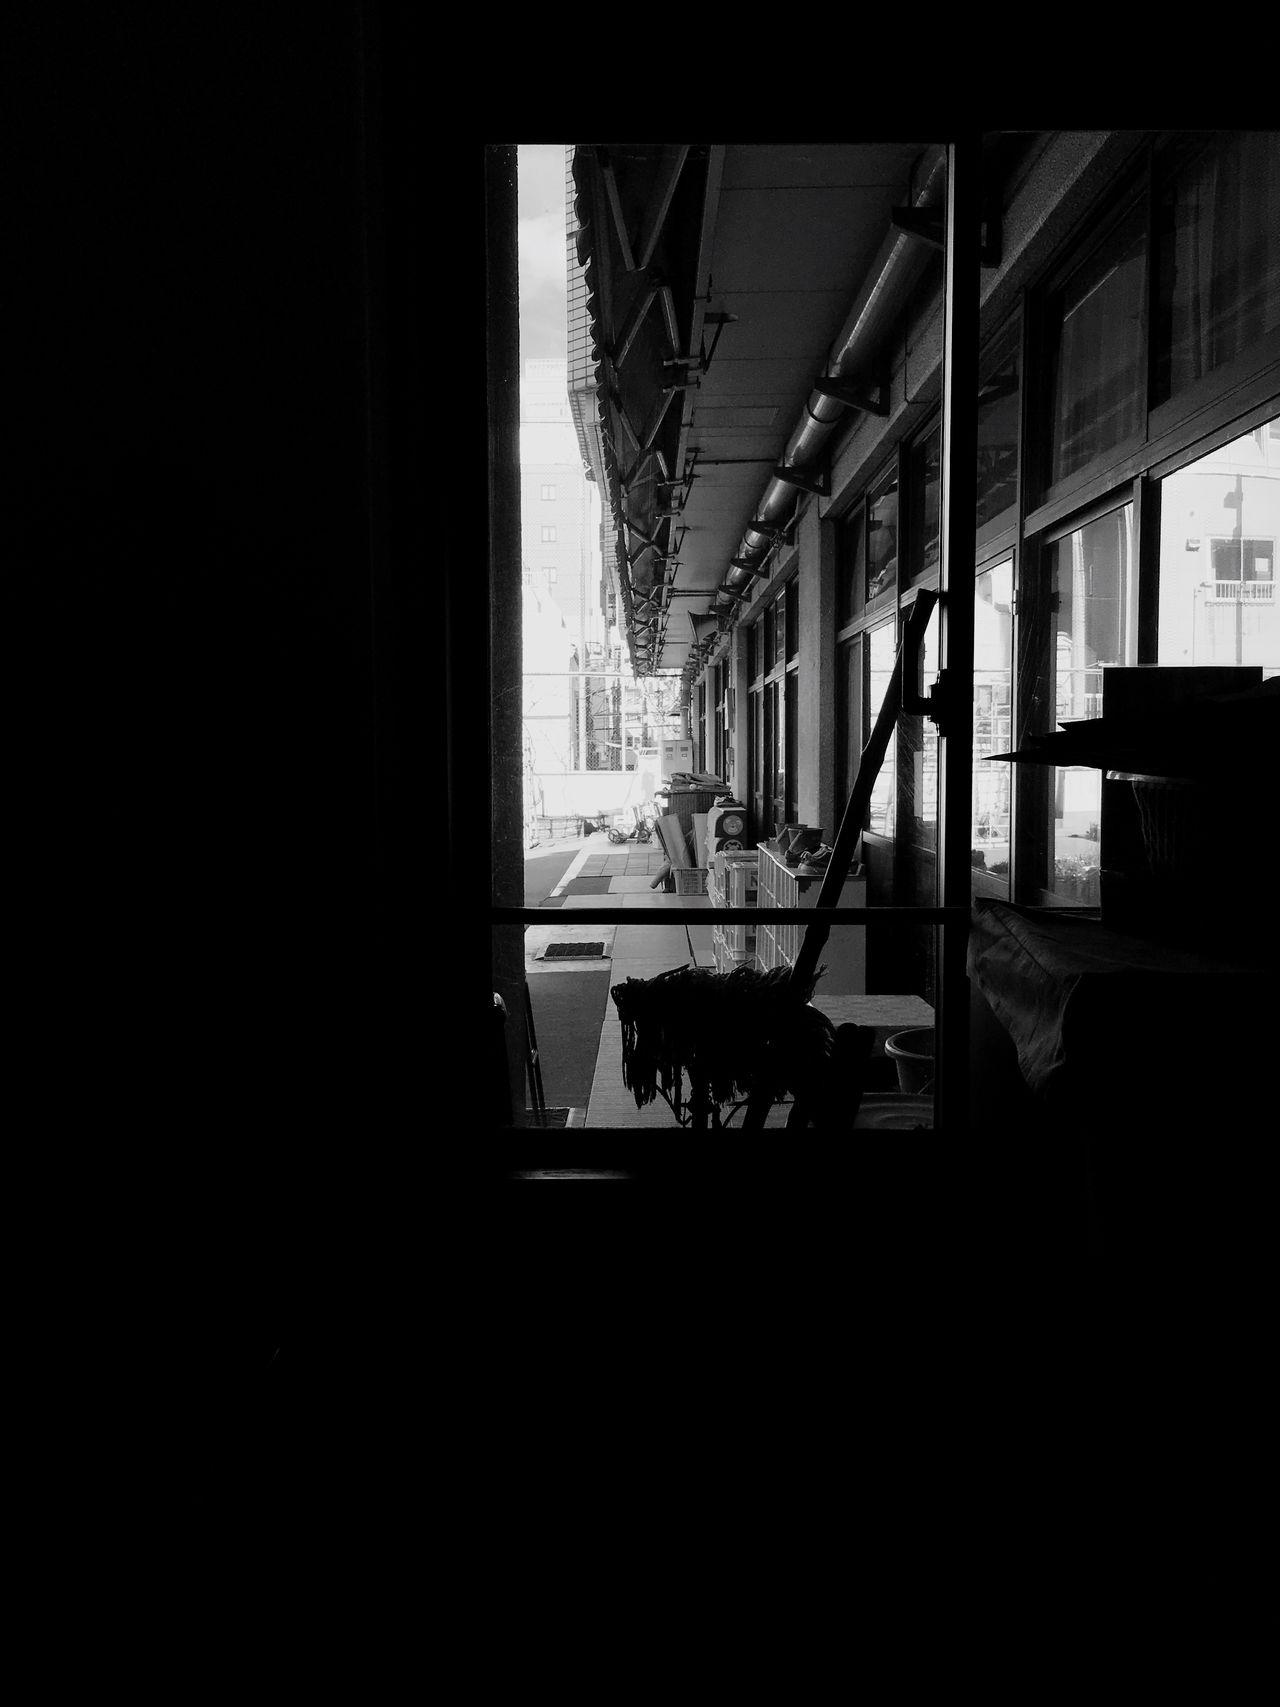 Kindergarten Black&white Black & White Black And White Blackandwhite Window